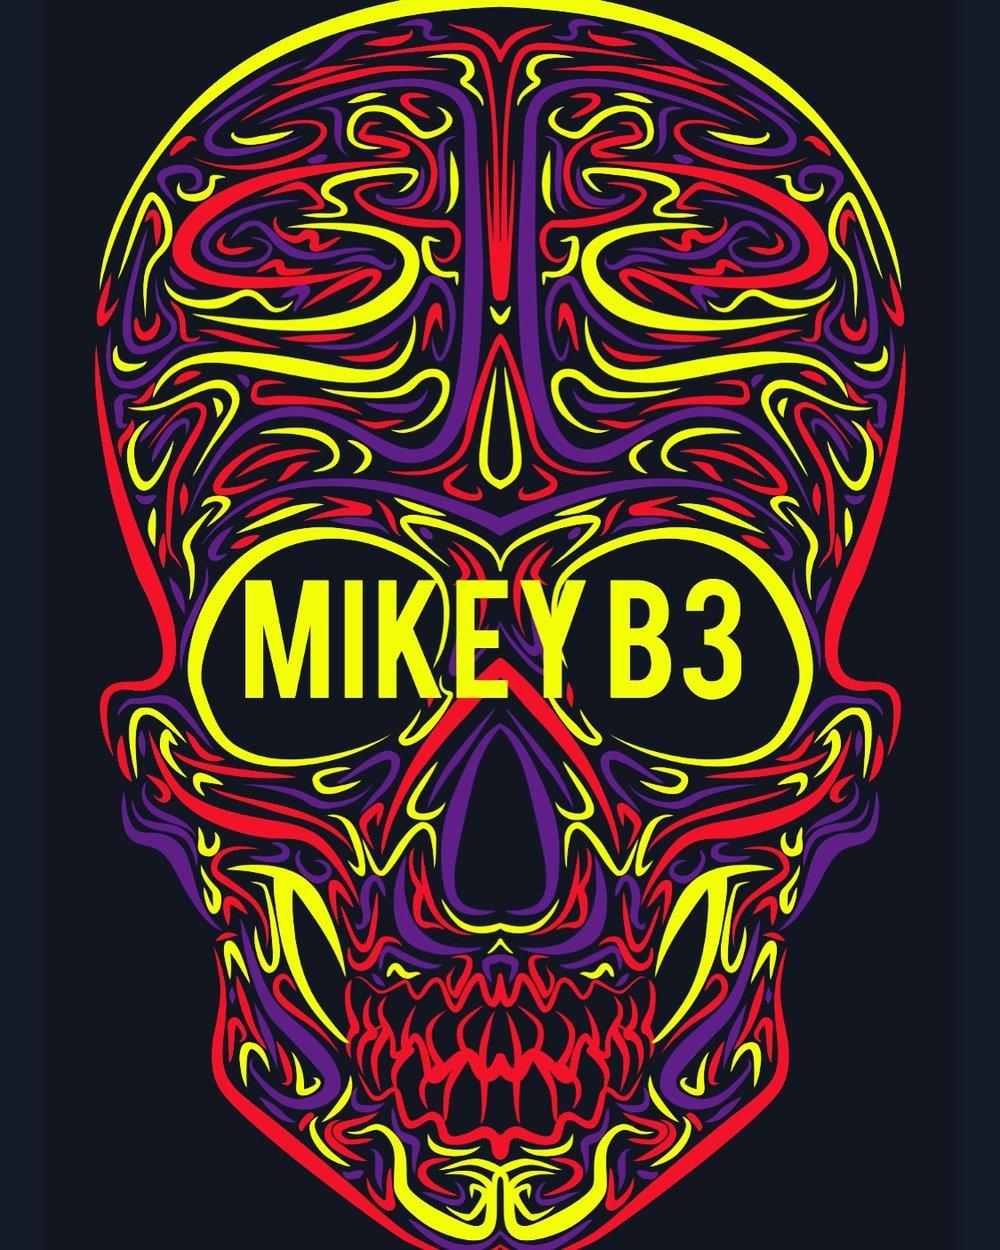 Mikey B3 IMG-1410.JPG